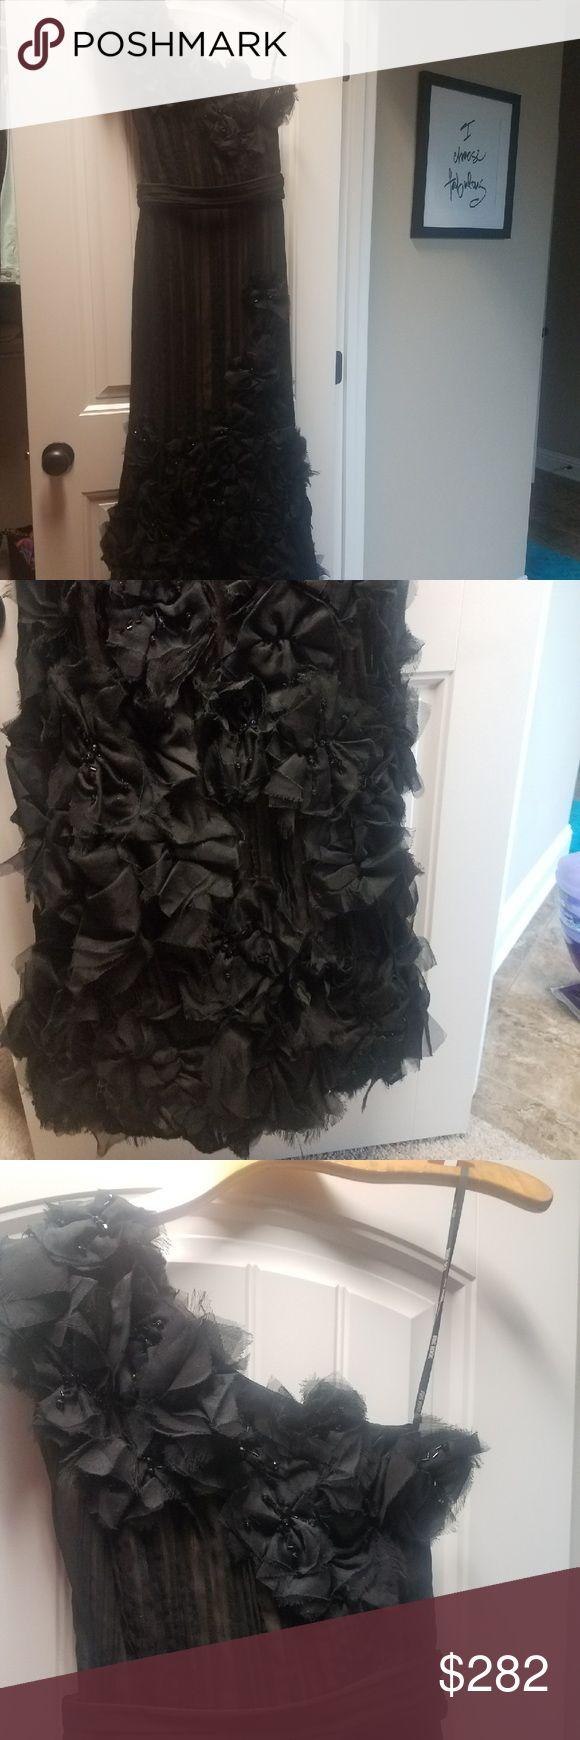 "Tadashi Shoji Ball gown ""Belle of the Ball"" Gorgeous Tadashi Shoji Ball Gown in size 6. Worn twice Tadashi Shoji Dresses"